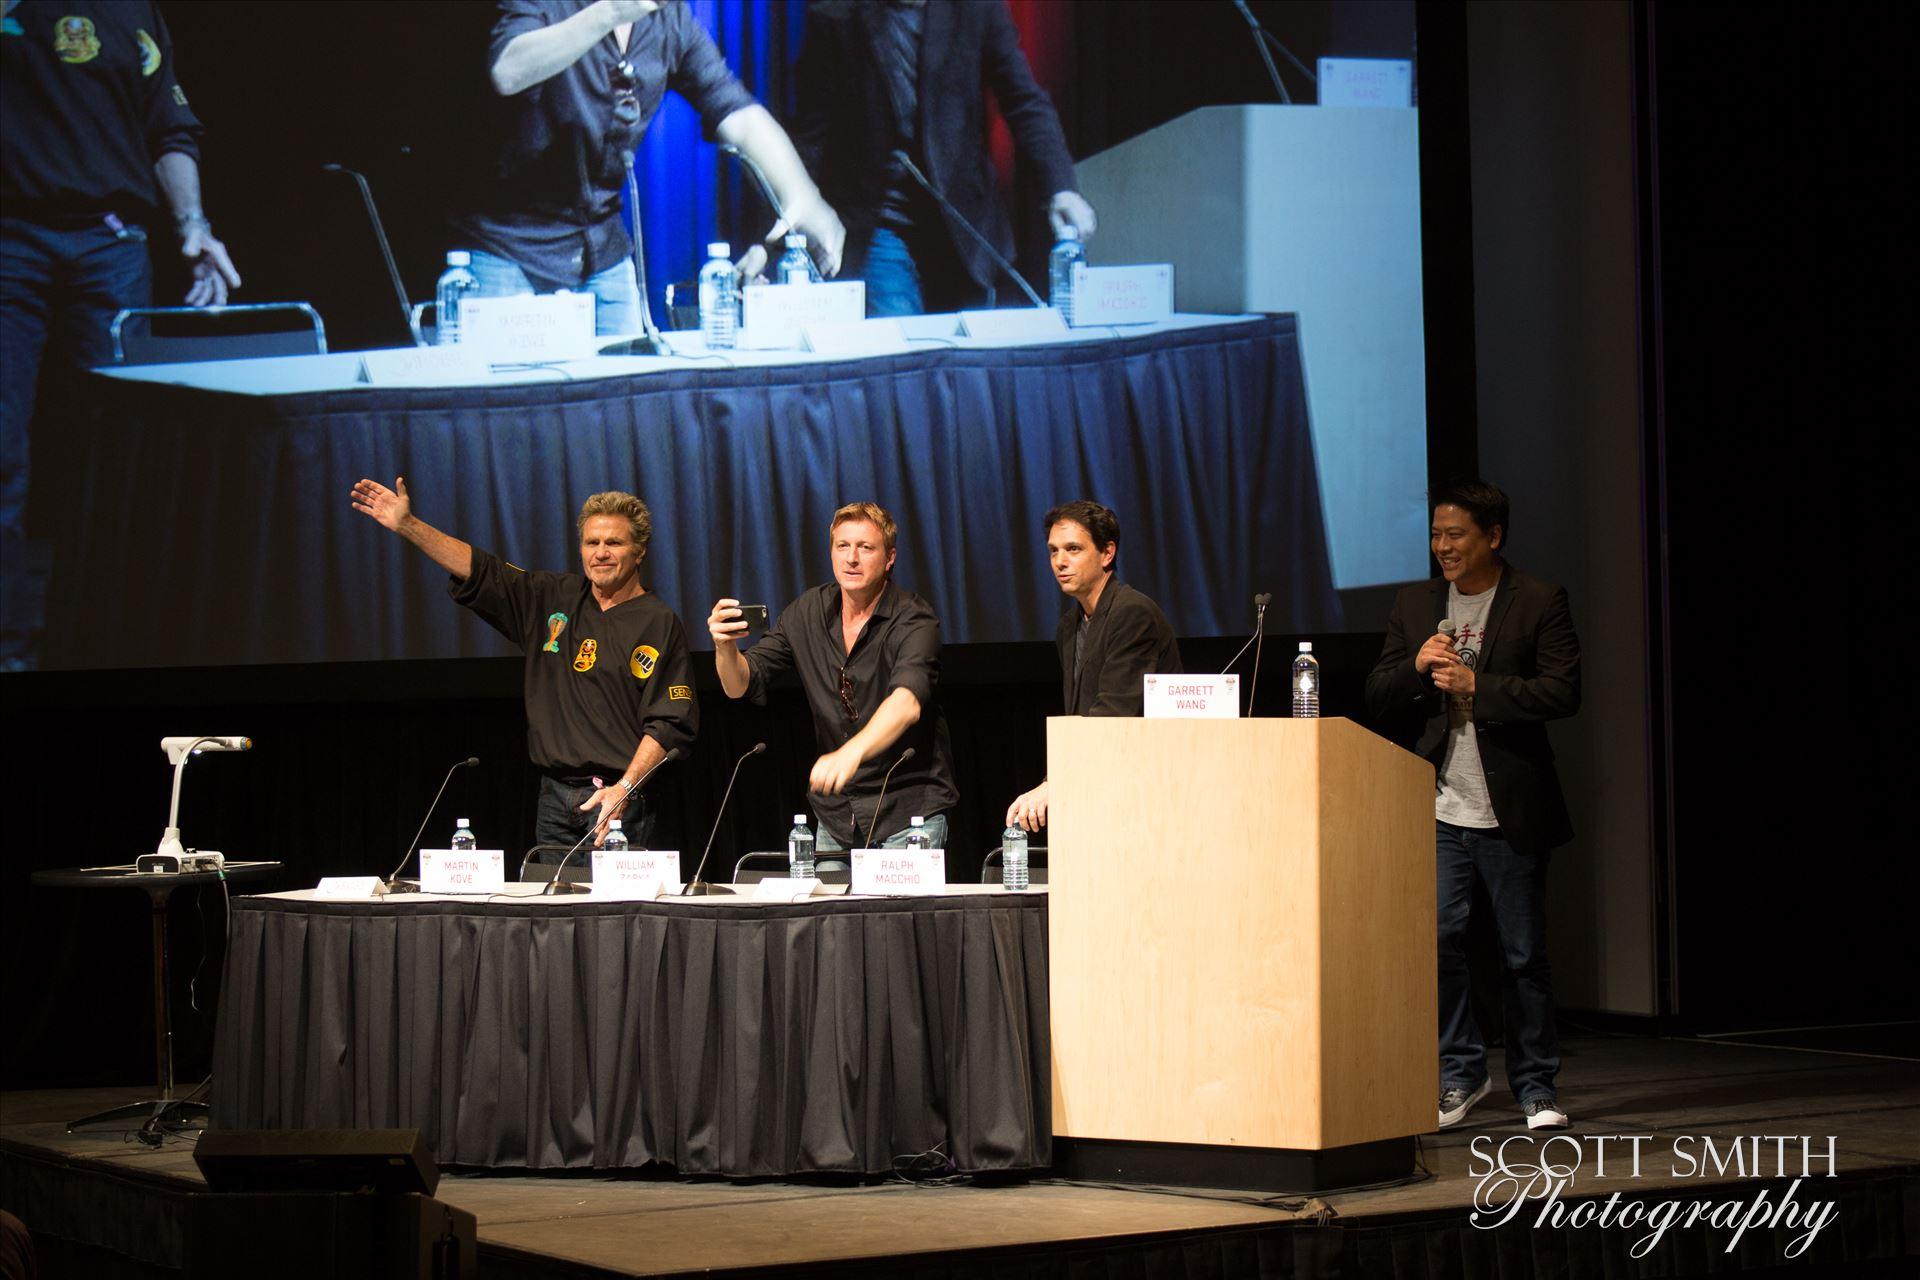 Denver Comic Con 2016 34 - Denver Comic Con 2016 at the Colorado Convention Center. Garrett Wang, Ralph Macchio, Martin Kove and William Zabka. by D Scott Smith